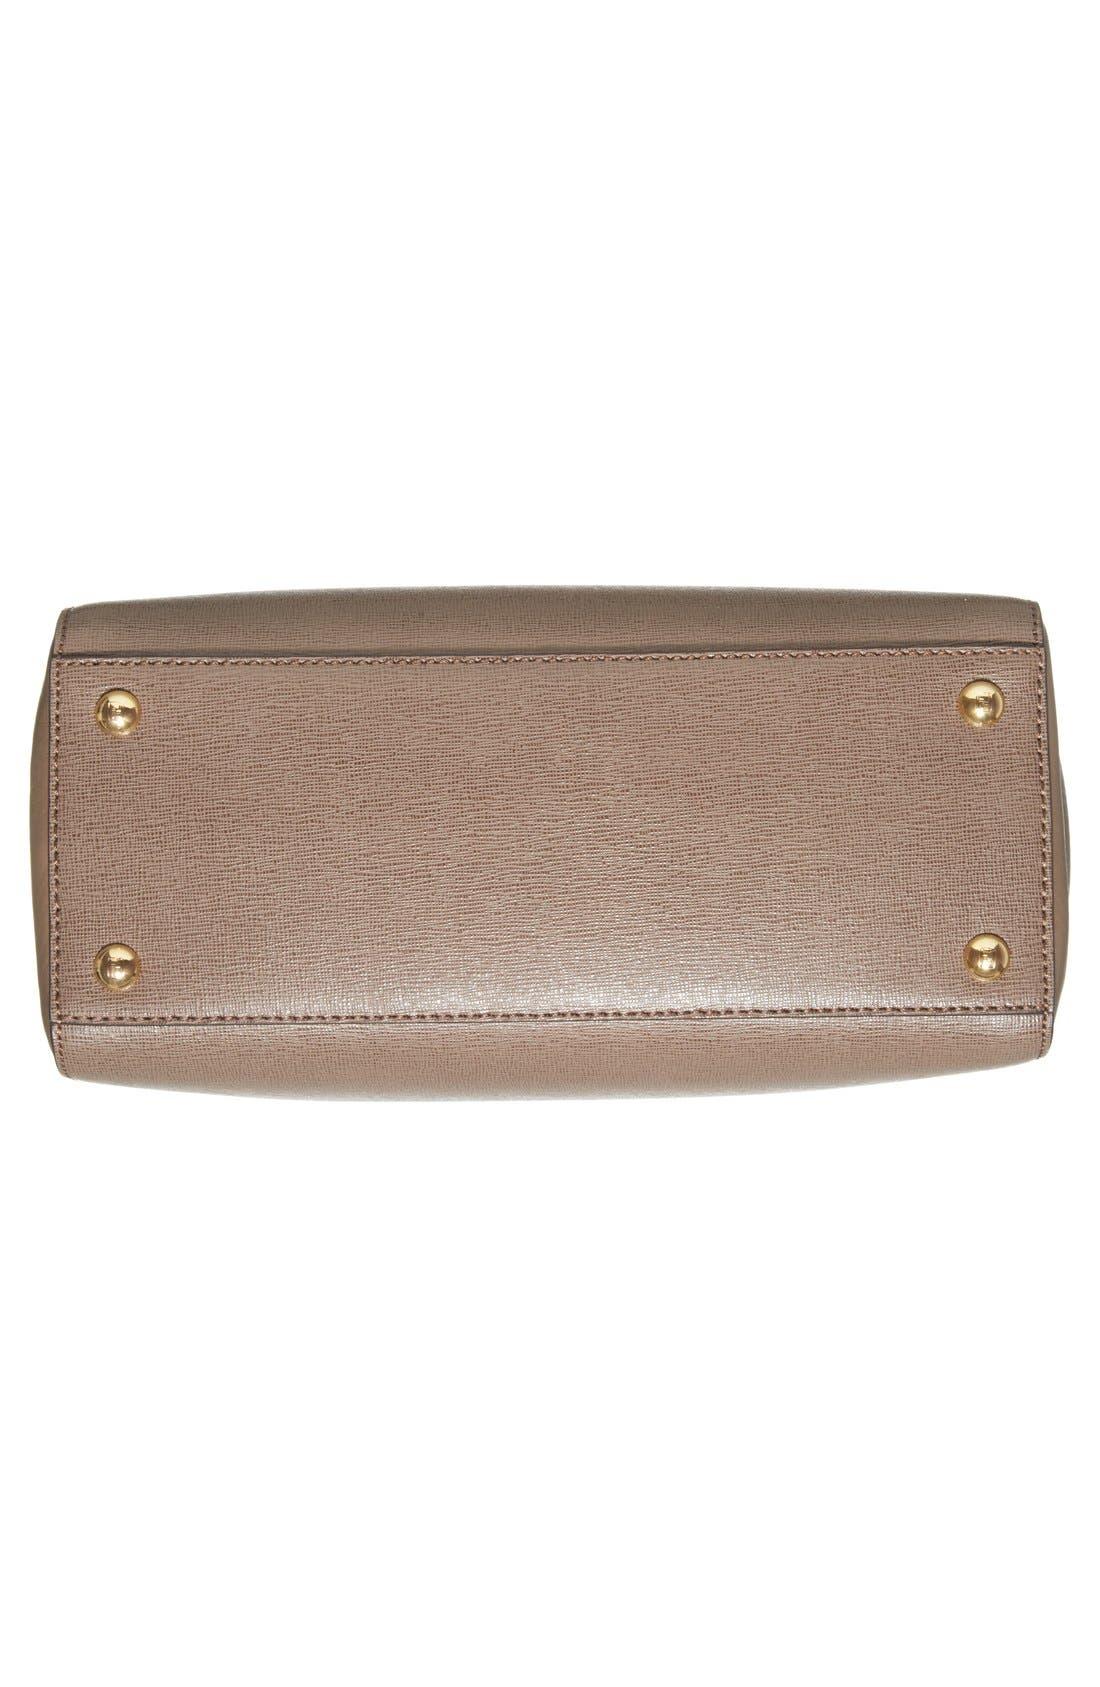 'Petite 2Jours Elite' Leather Shopper,                             Alternate thumbnail 113, color,